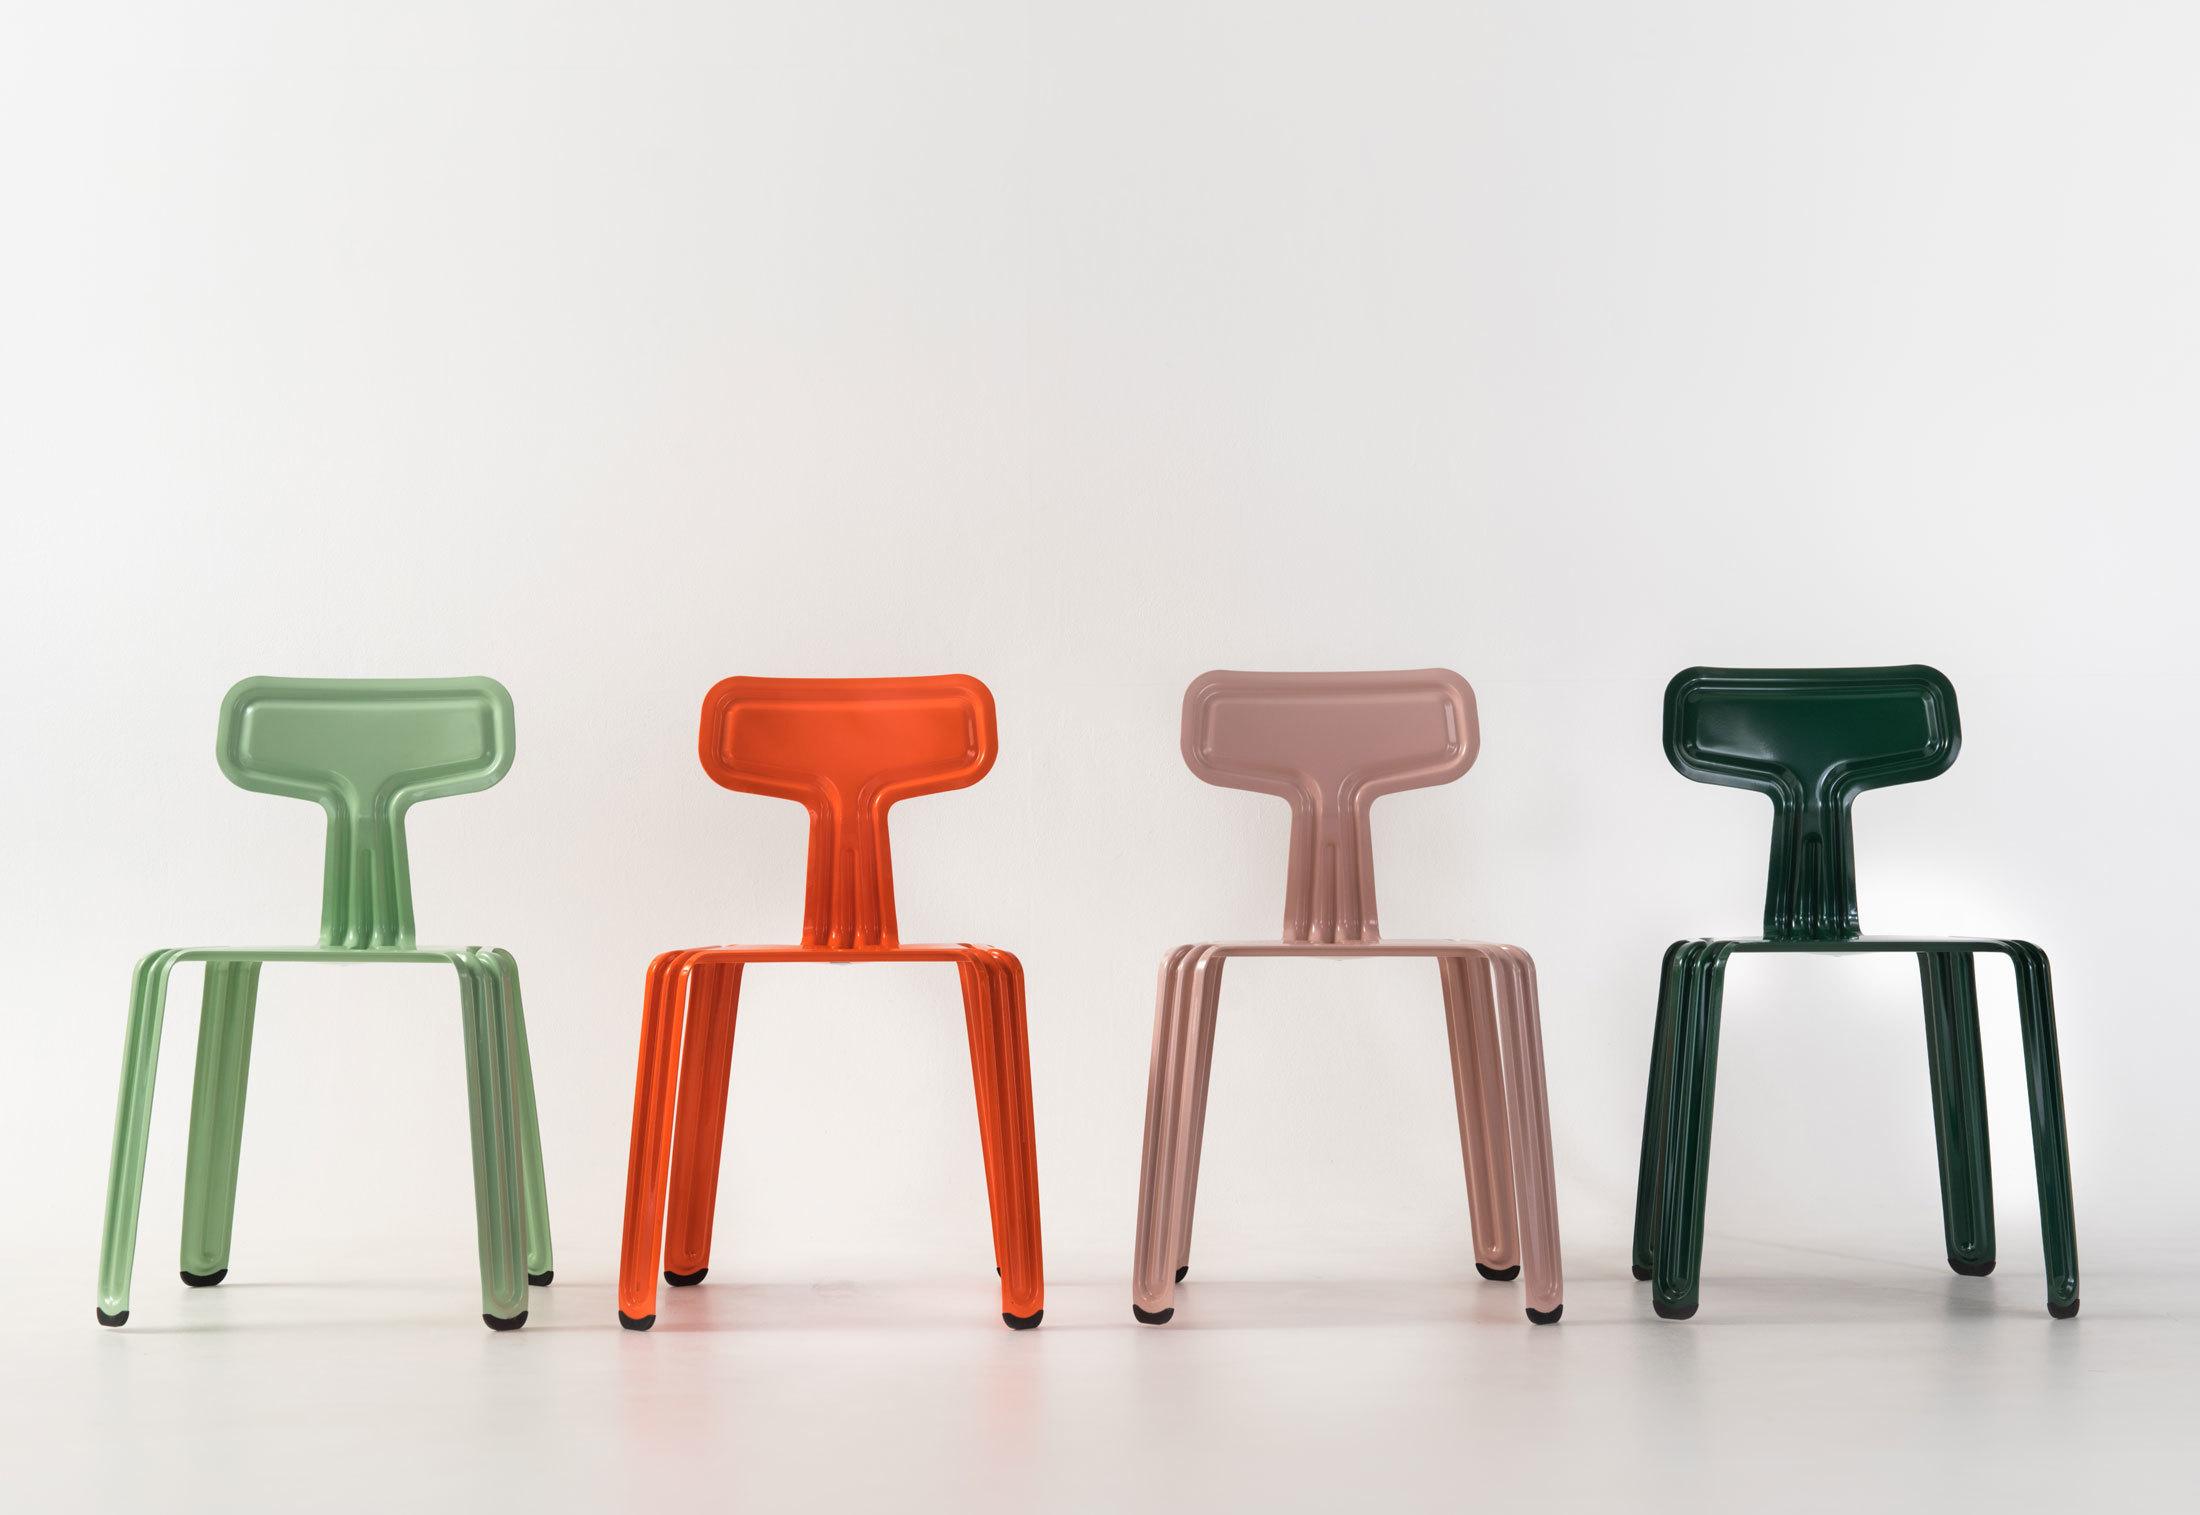 Pressed Chair By Nils Holger Moormann Stylepark